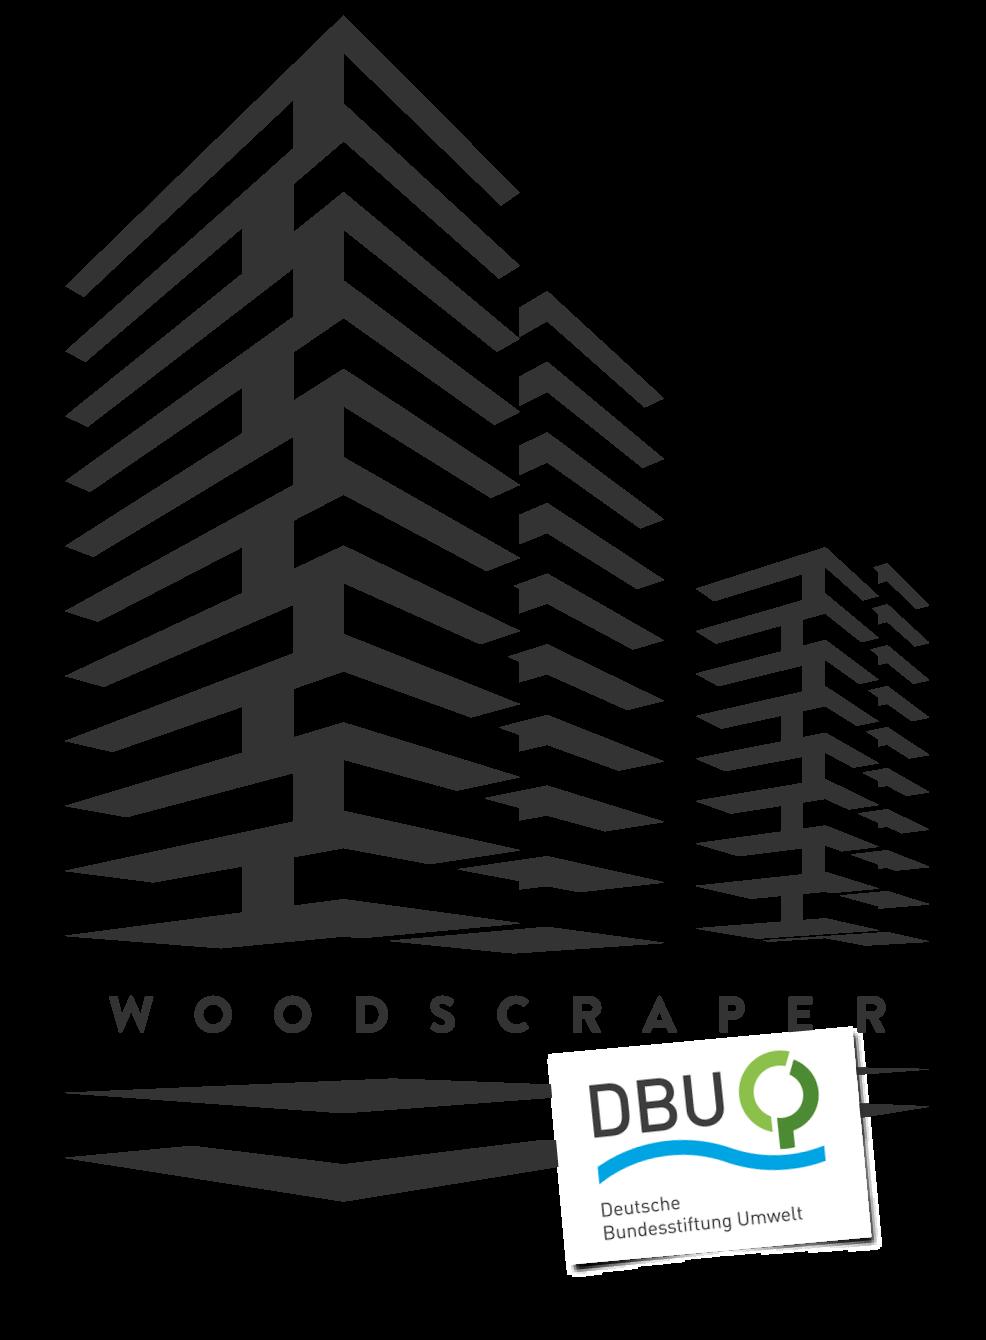 Woodscraper_Logo_DBU.png